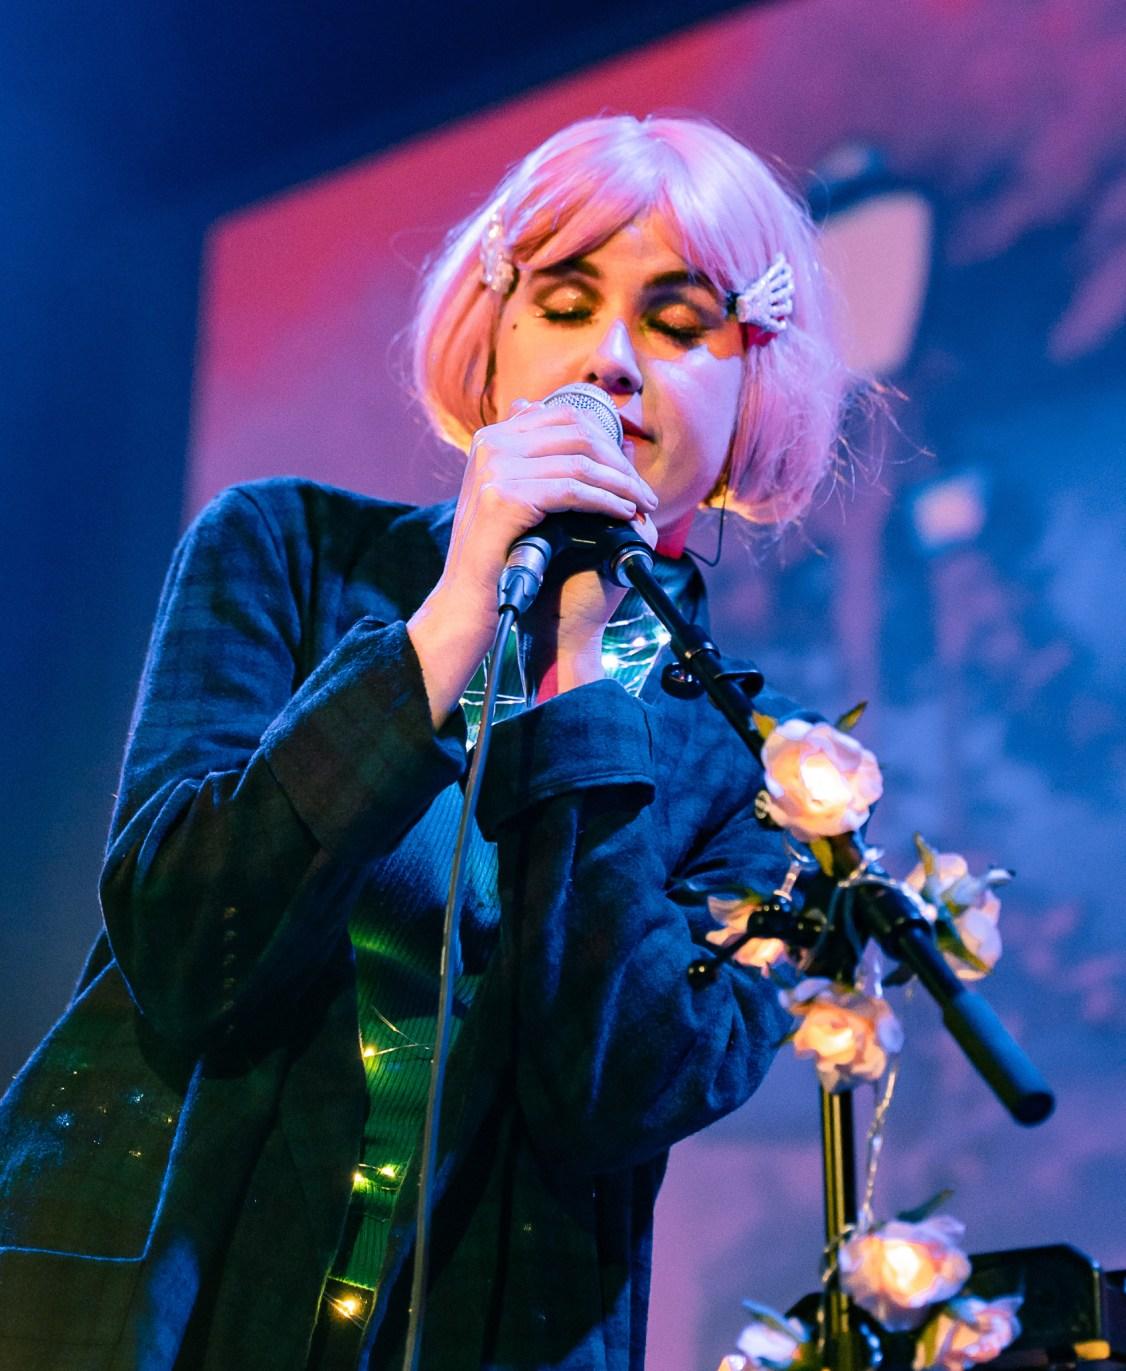 Concert Review: Princess Chelsea, Auckland New Zealand, 2018